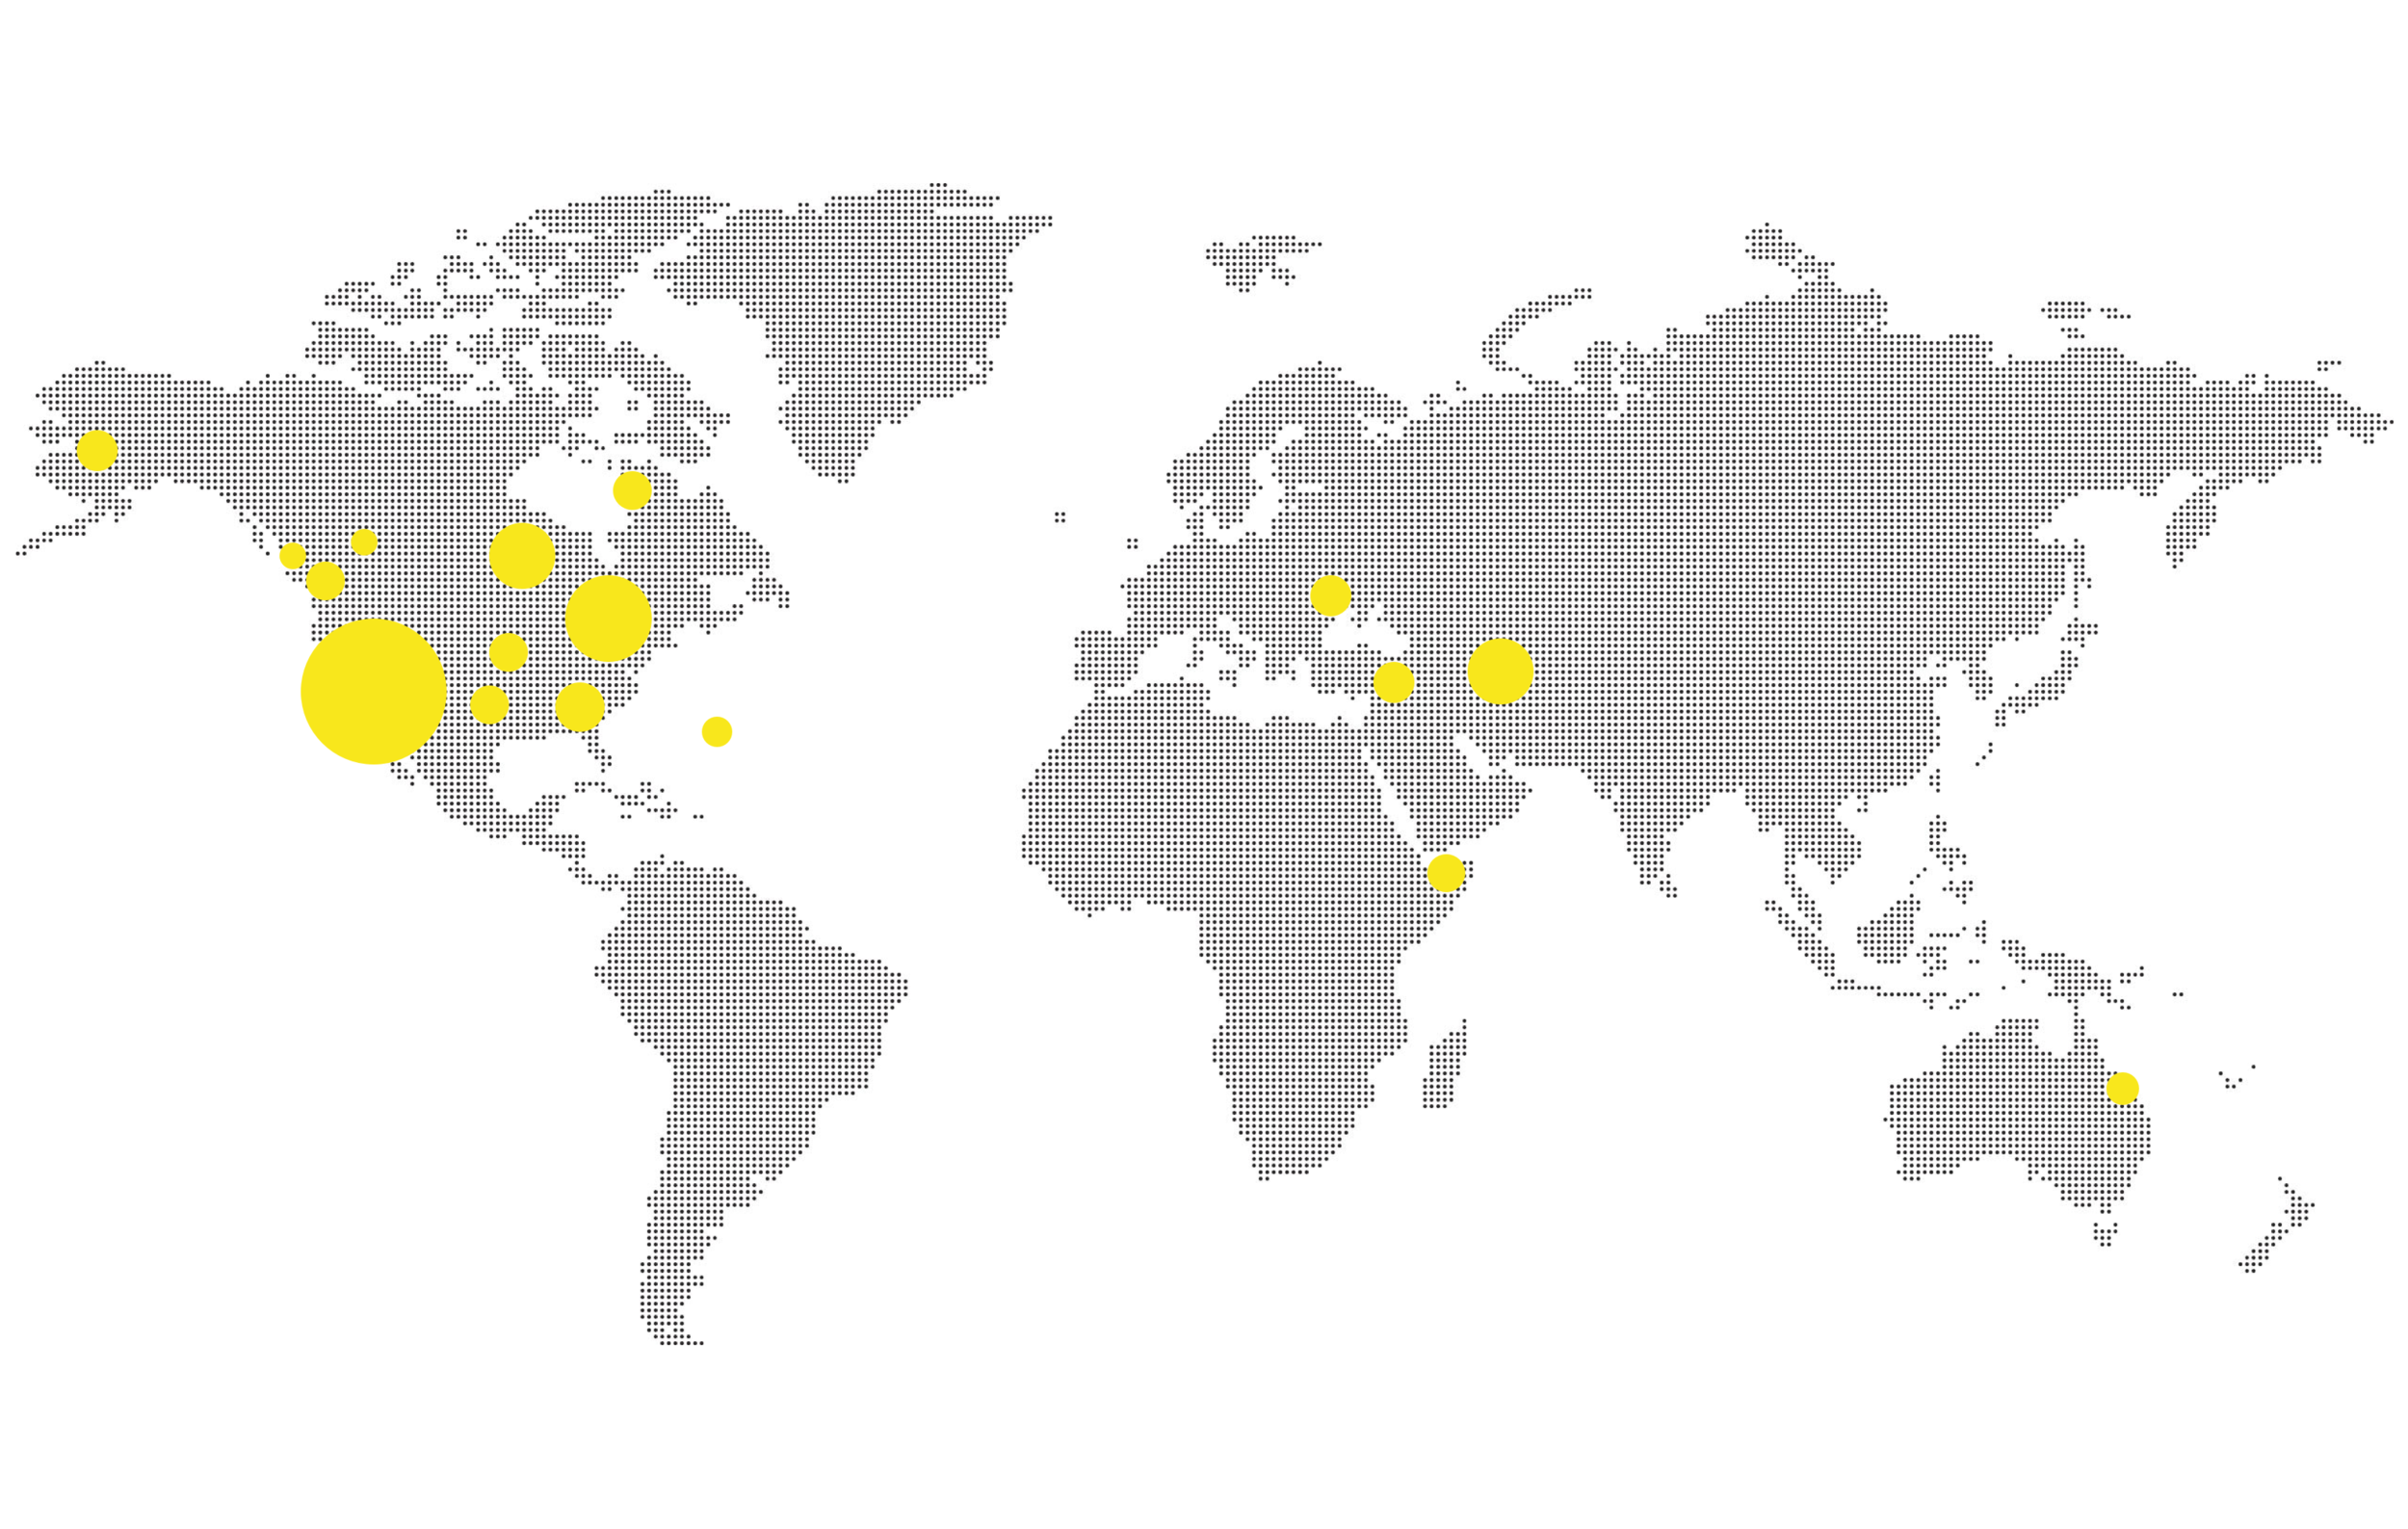 Travel Ban Global Stories .png